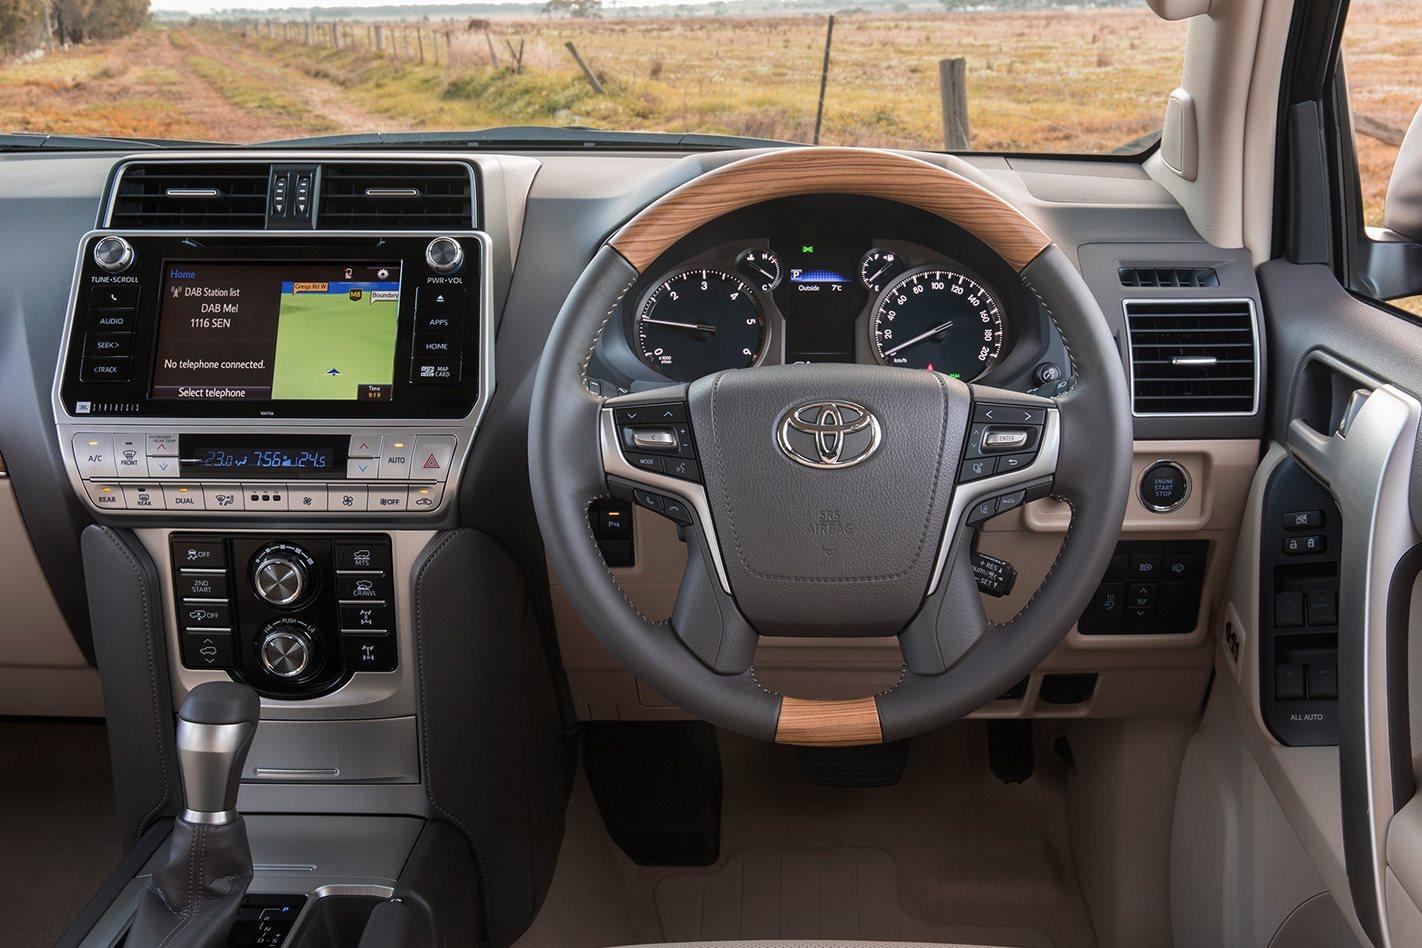 Toyota-Prado-interior.jpg